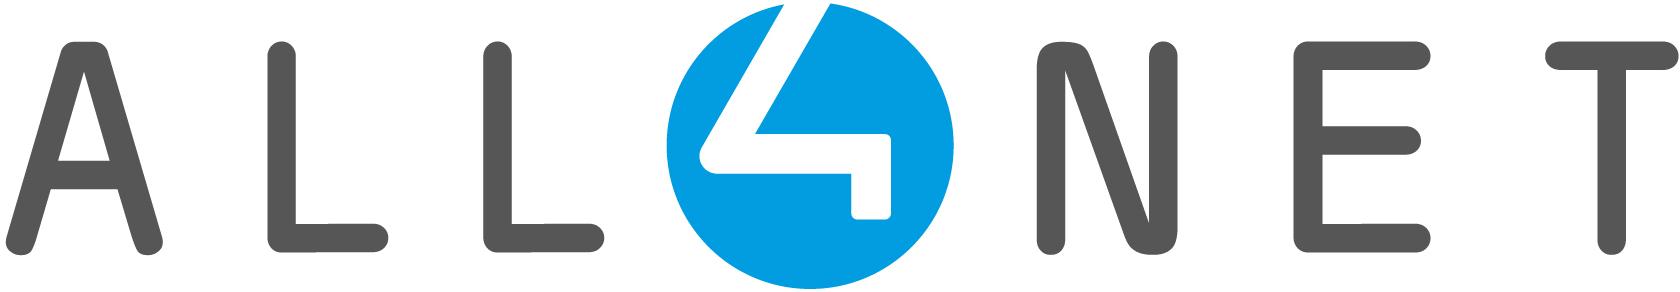 all4net Logo